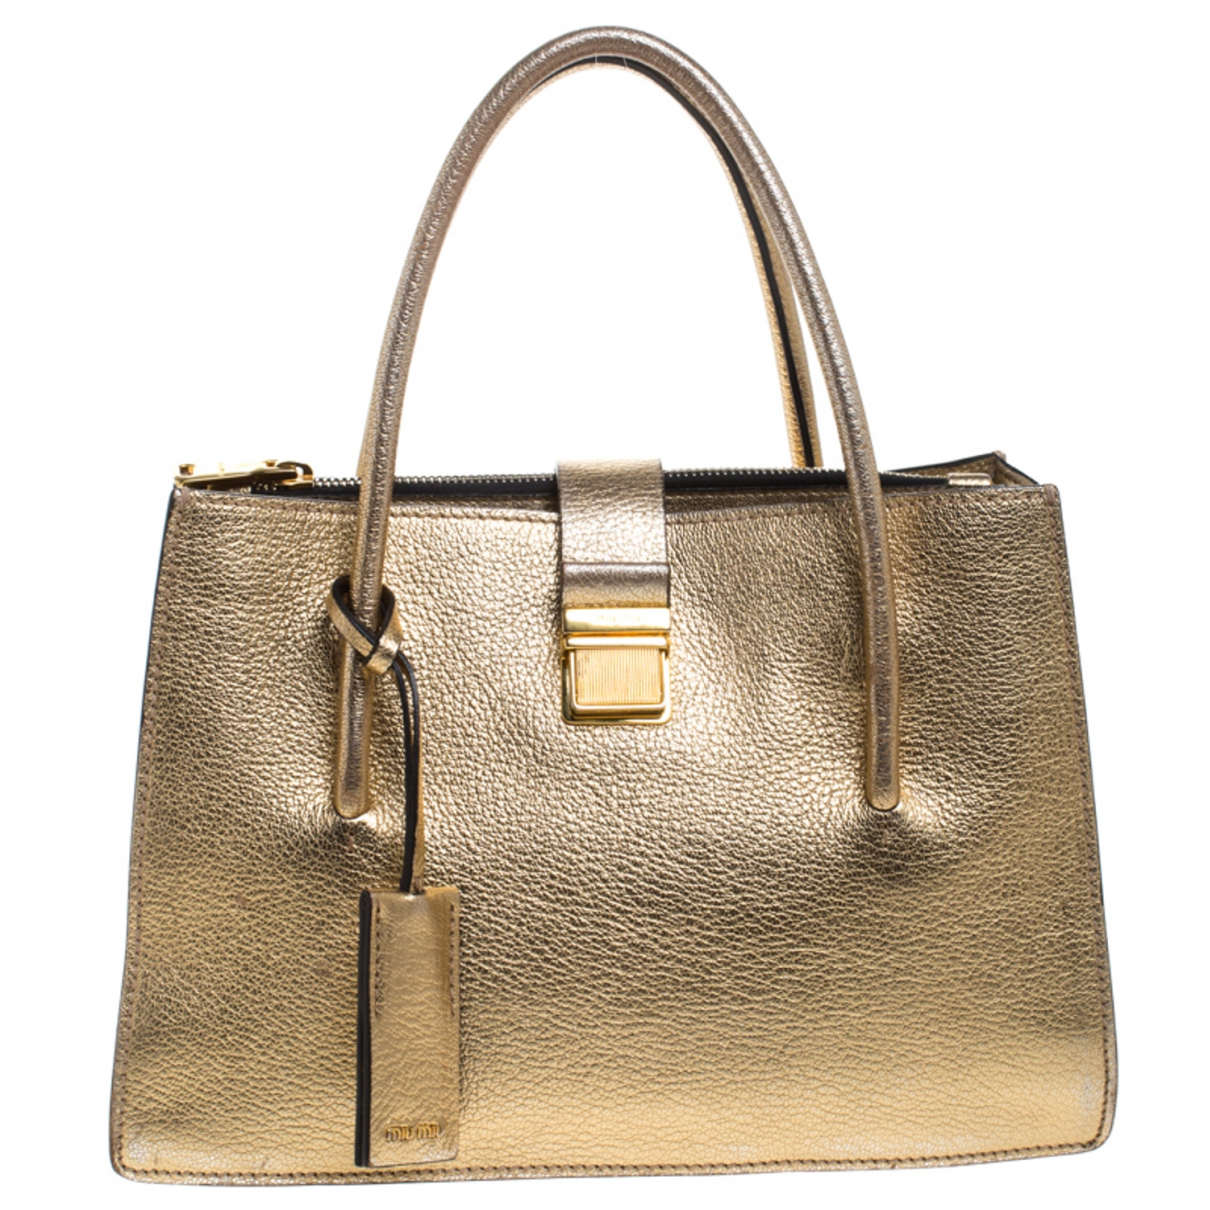 Miu Miu Madras Gold Leather handbag for Women \N